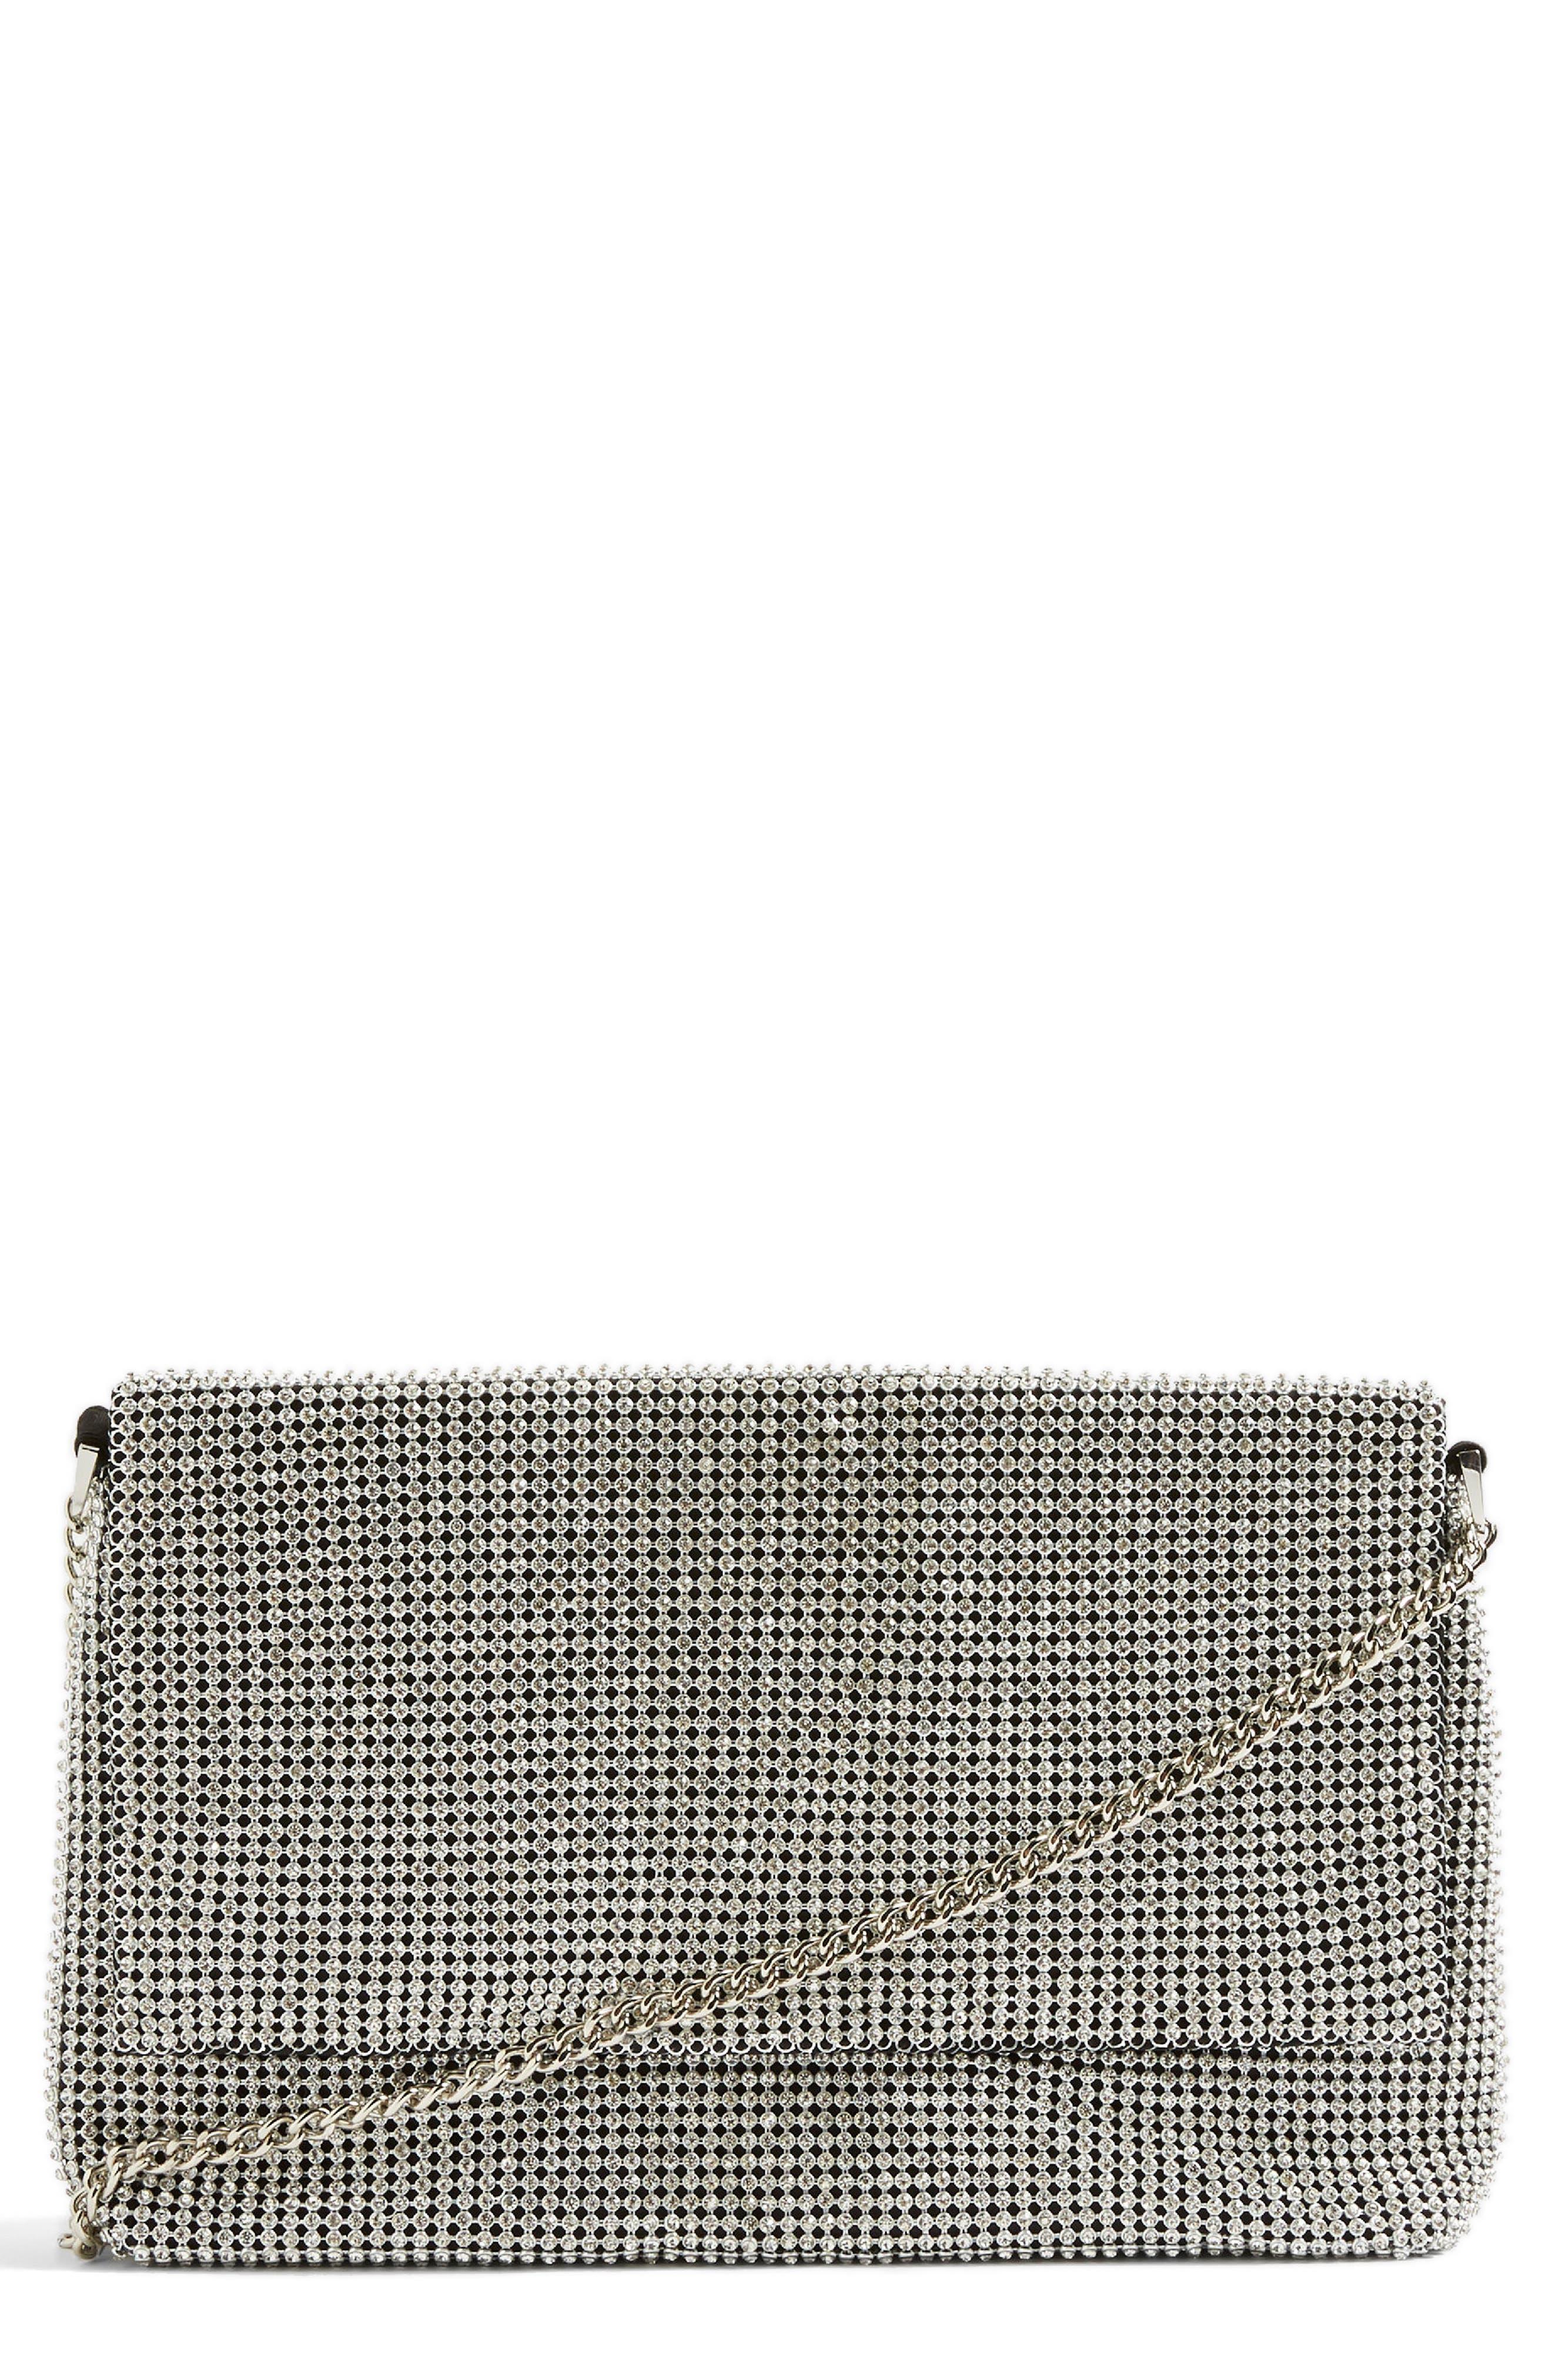 Diana Diamante Clutch Bag,                             Main thumbnail 1, color,